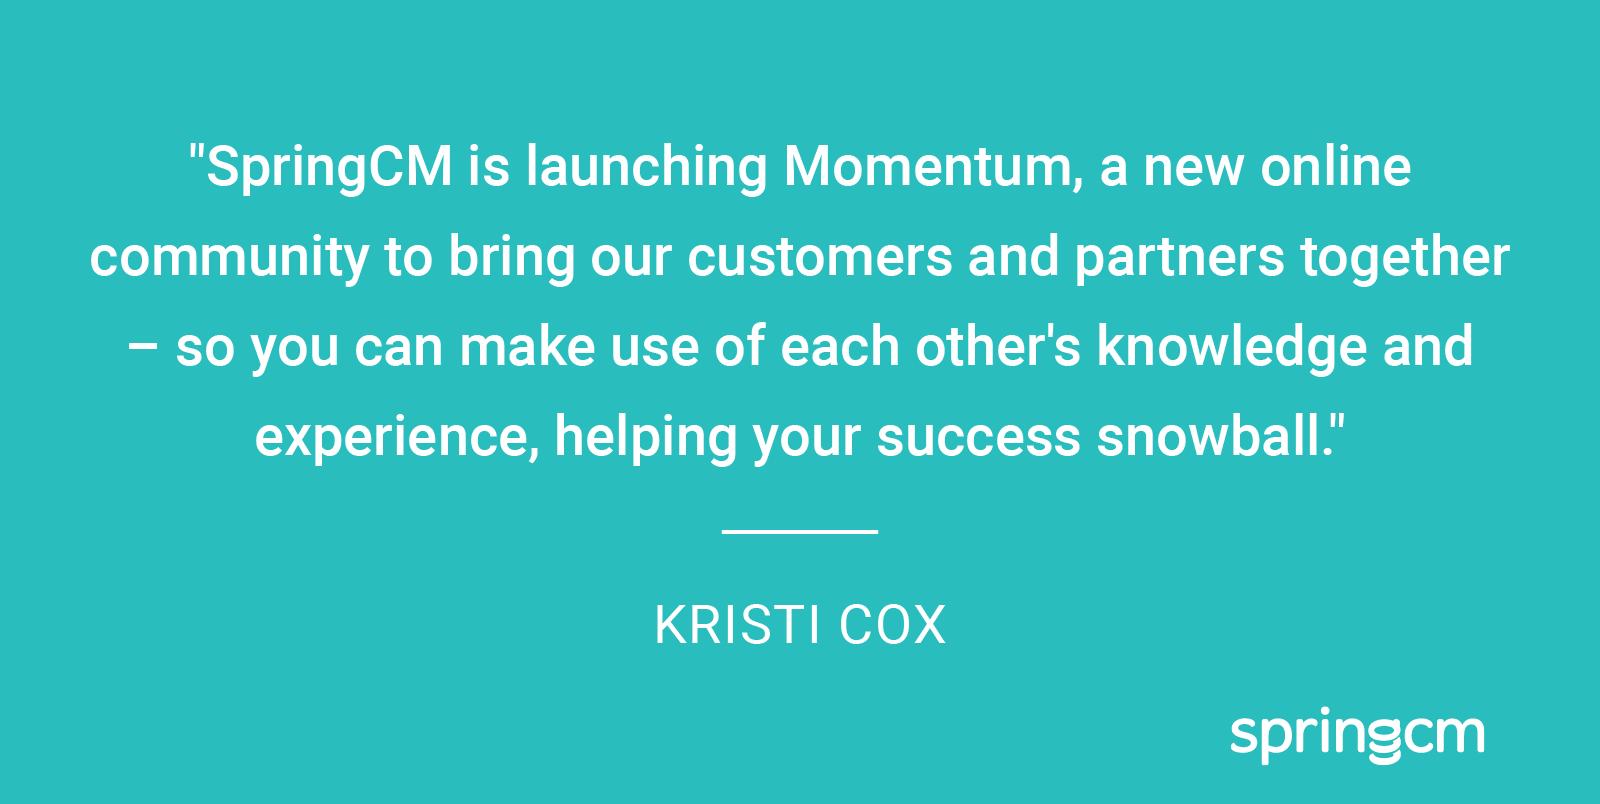 SpringCM is launching Momentum.